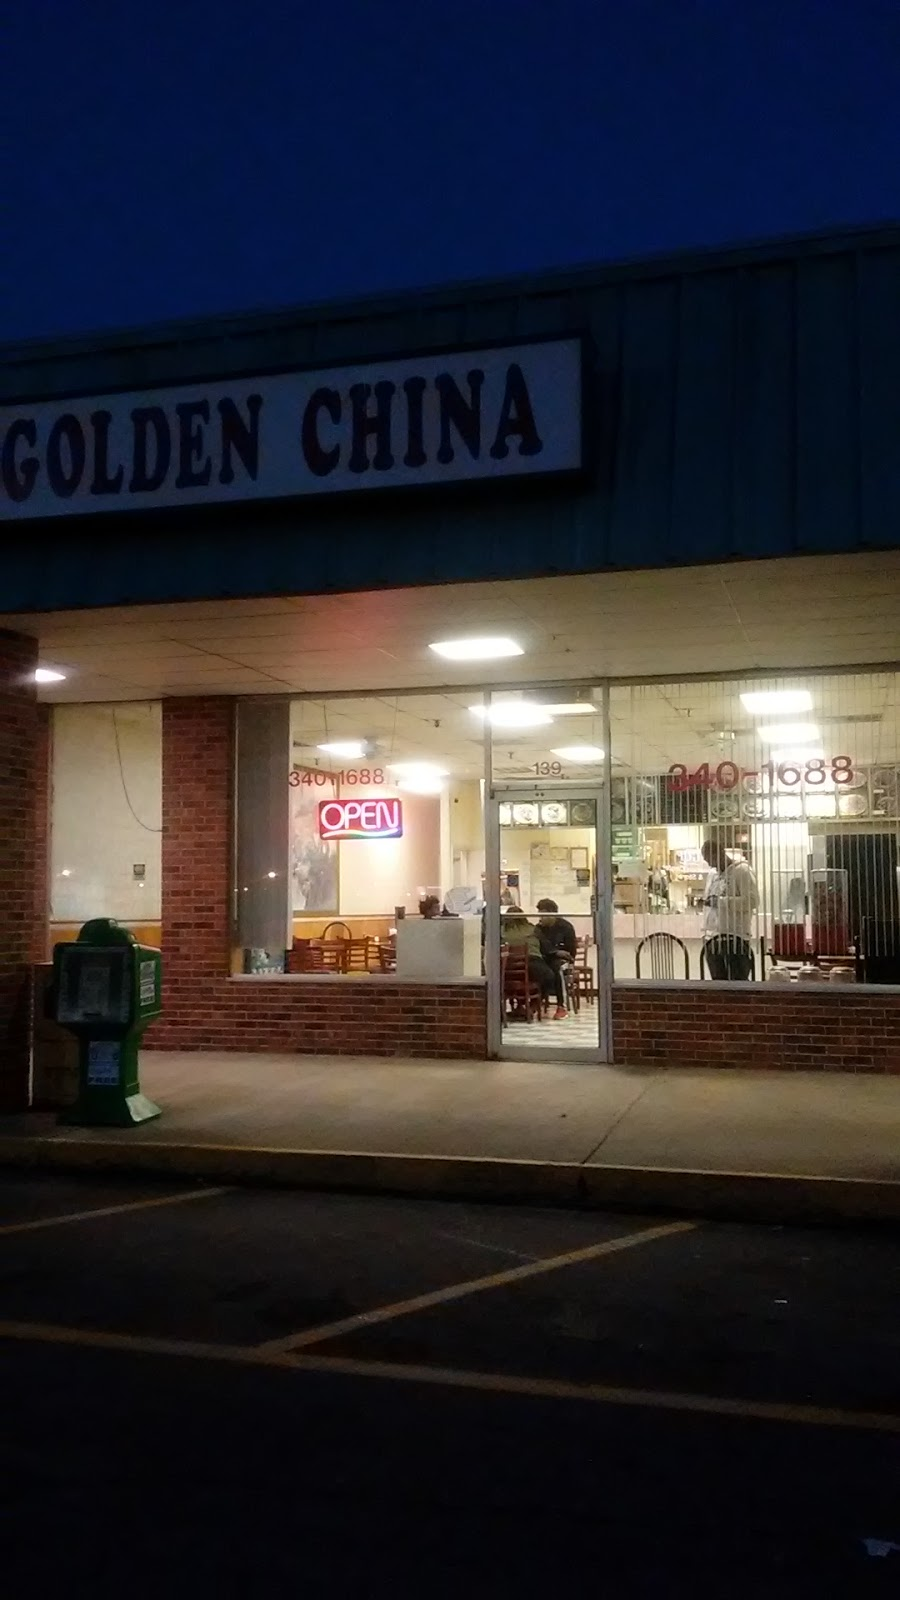 Golden China Restaurant - restaurant    Photo 7 of 10   Address: 135 Shannon Village, Louisburg, NC 27549, USA   Phone: (919) 340-1688